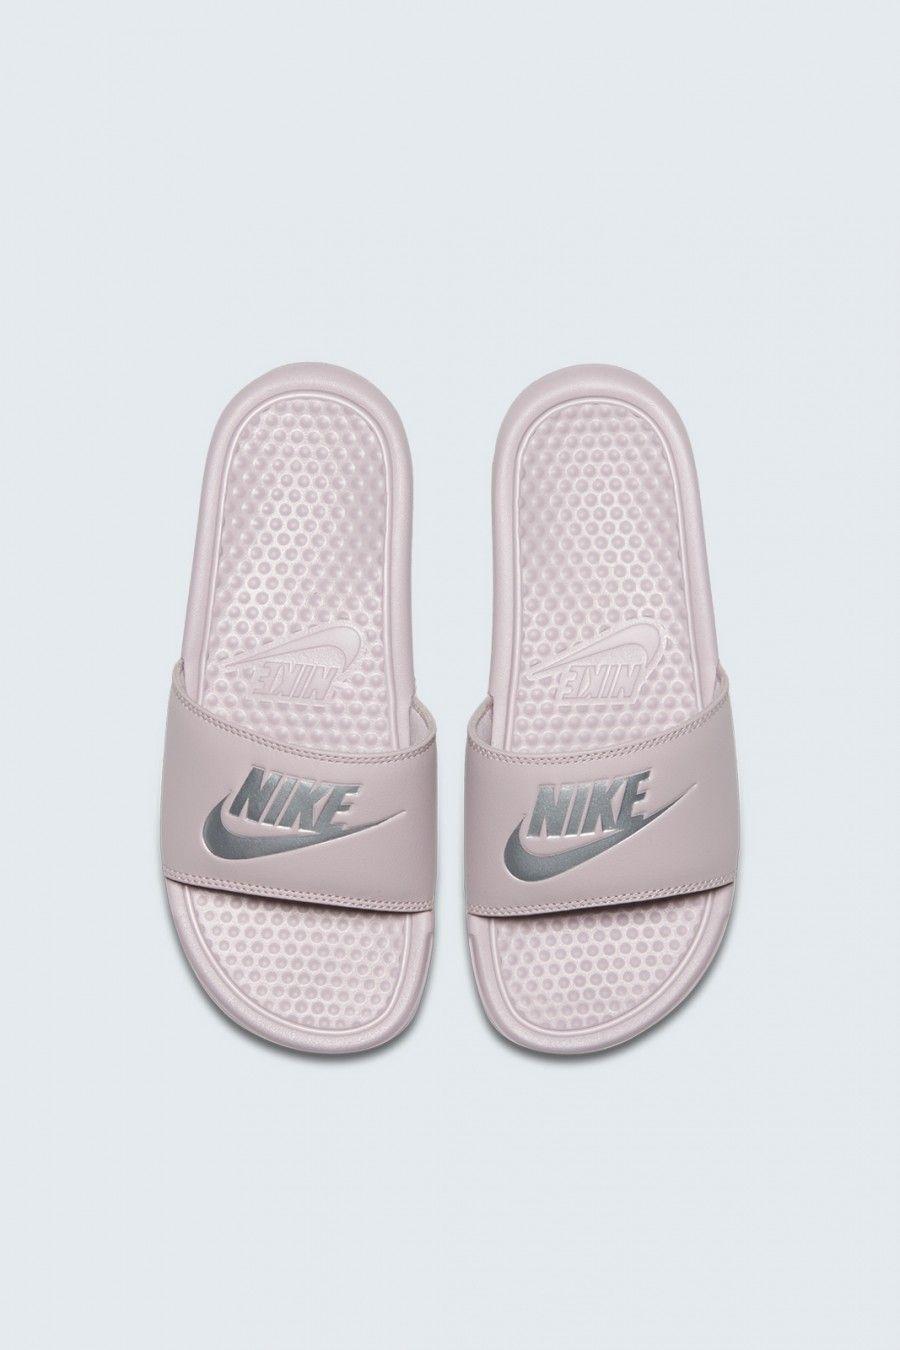 all white nike slippers